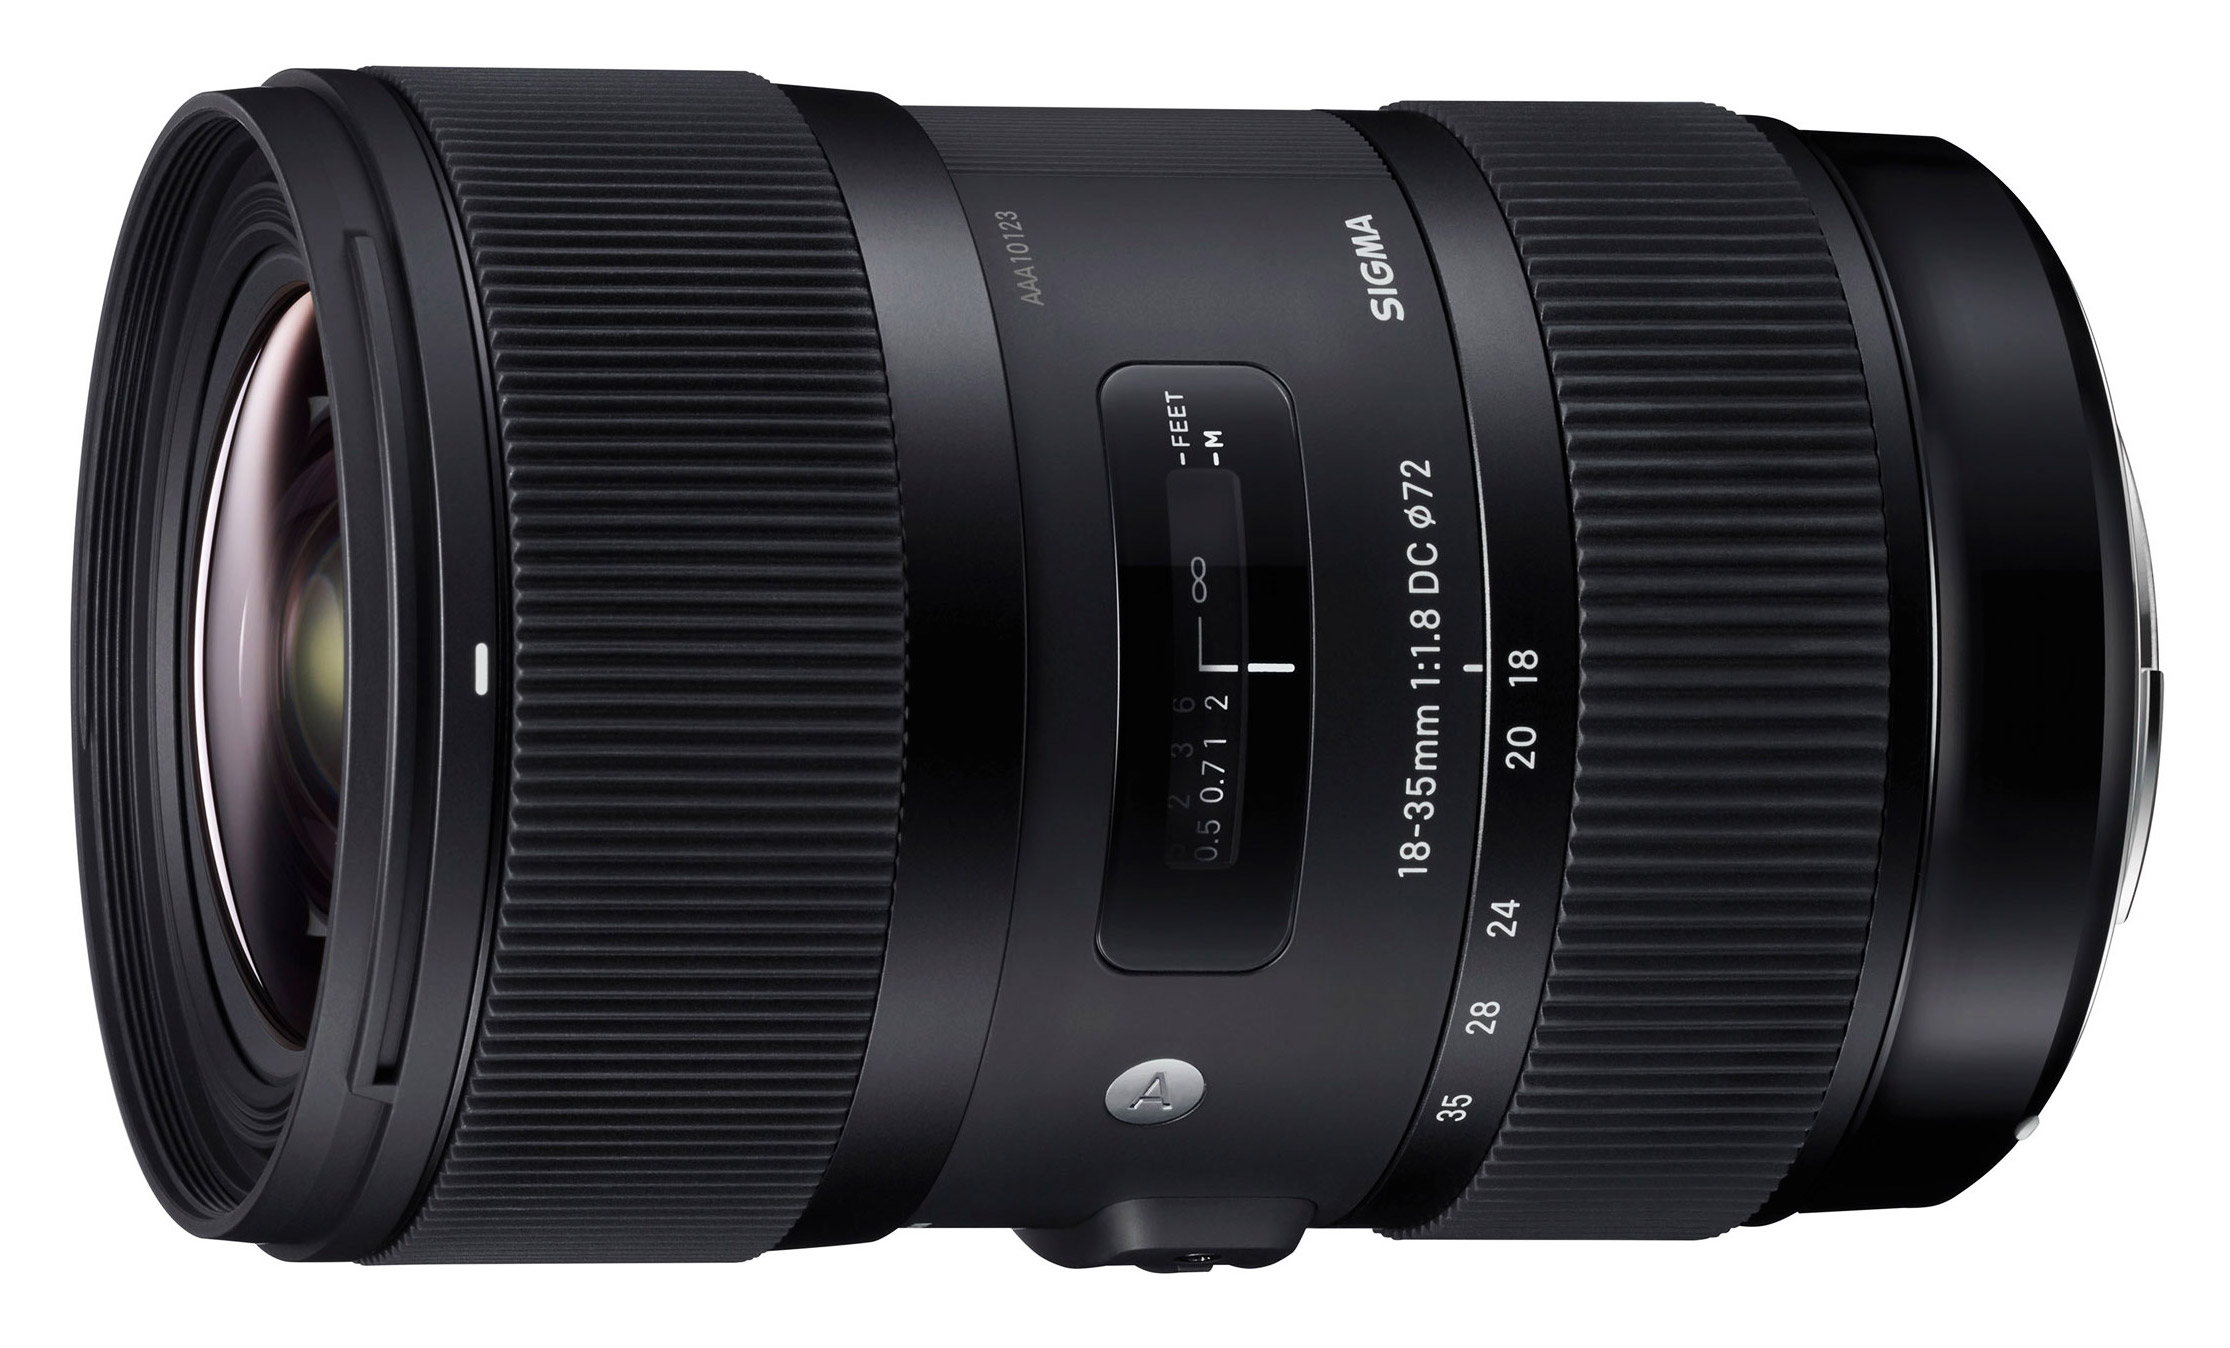 Sigma 18-35mm f/1,8 DC HSM Art Canon